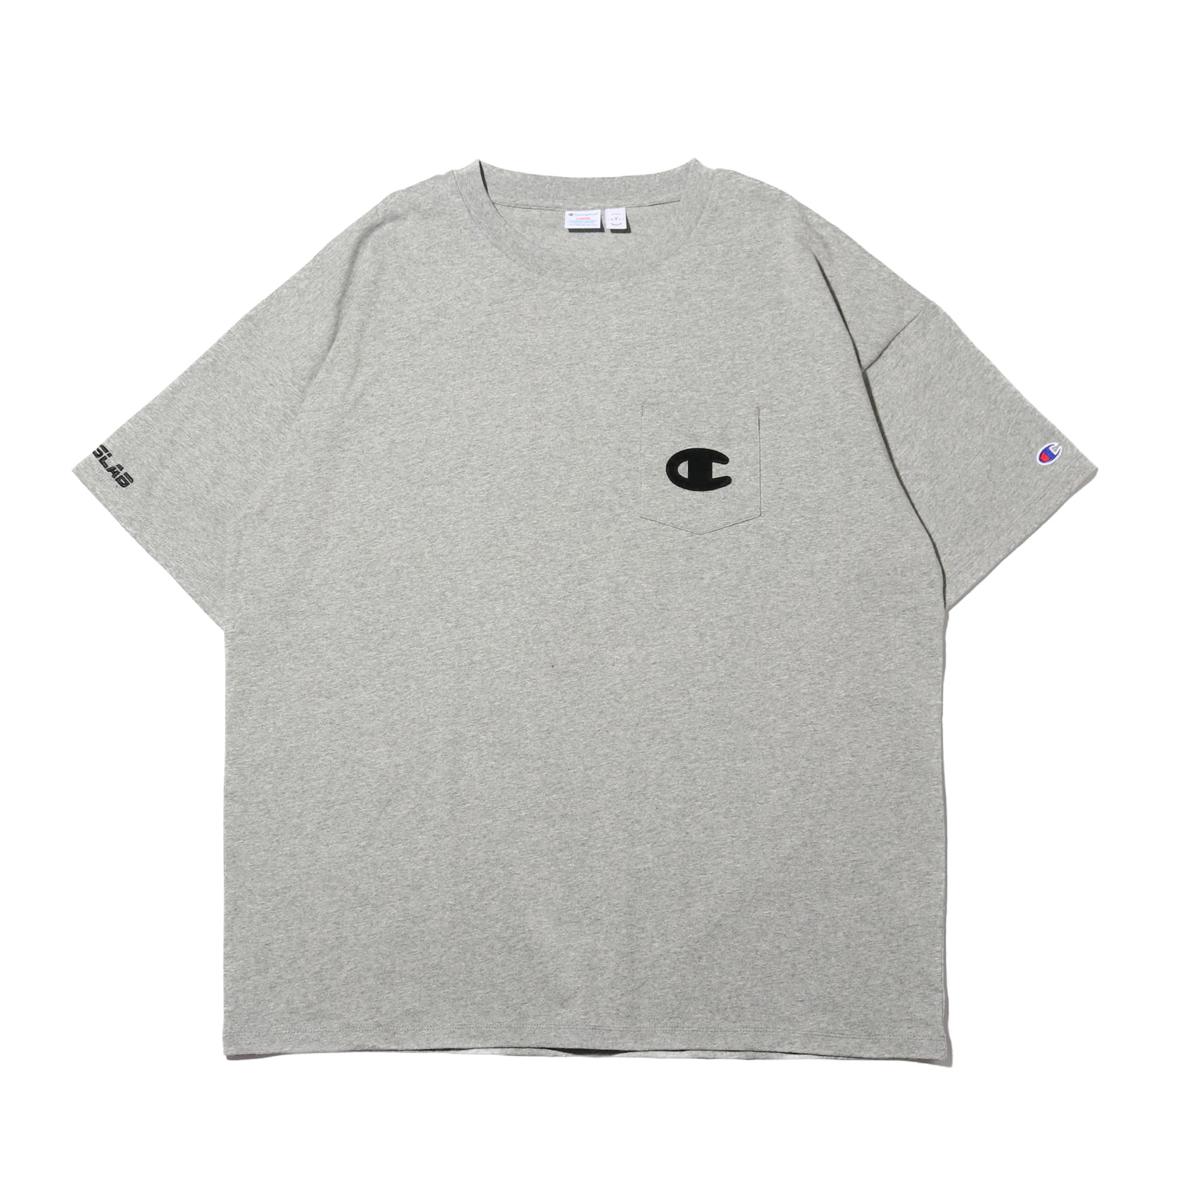 CHAMPION x ATMOS LAB LAB S/S POCKET T-SHIRT (チャンピオン × アトモスラボ ショートスリーブ ポケット ティーシャツ)オックスフォードグレー【メンズ Tシャツ】19SP-S